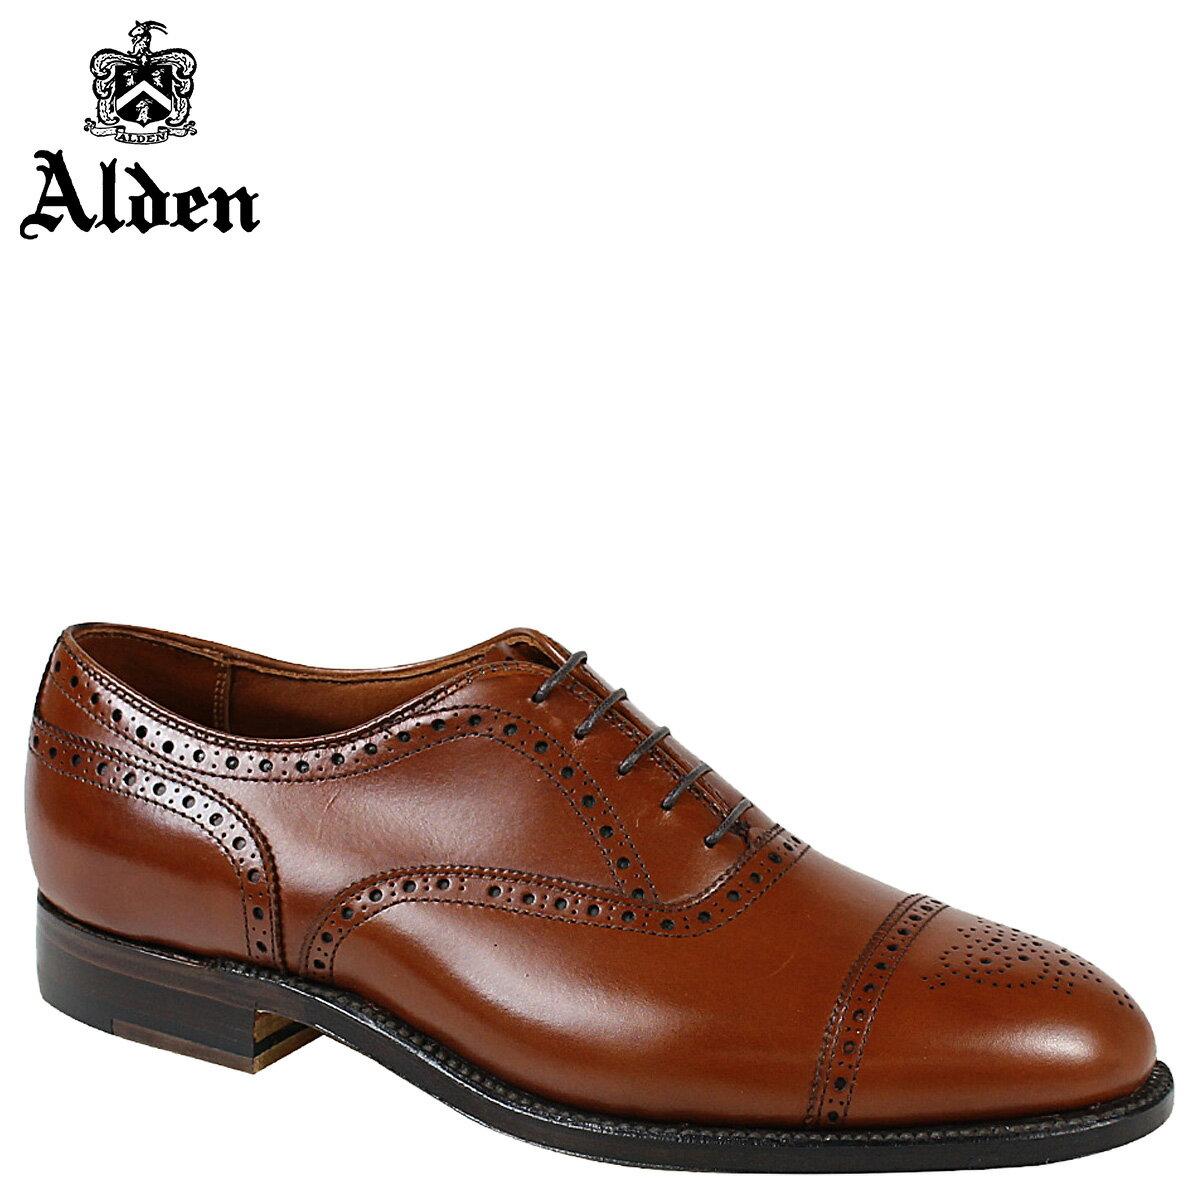 ALDEN オールデン オックスフォード シューズ メンズ MEDALLION TIP BAL OXFORD Dワイズ 911